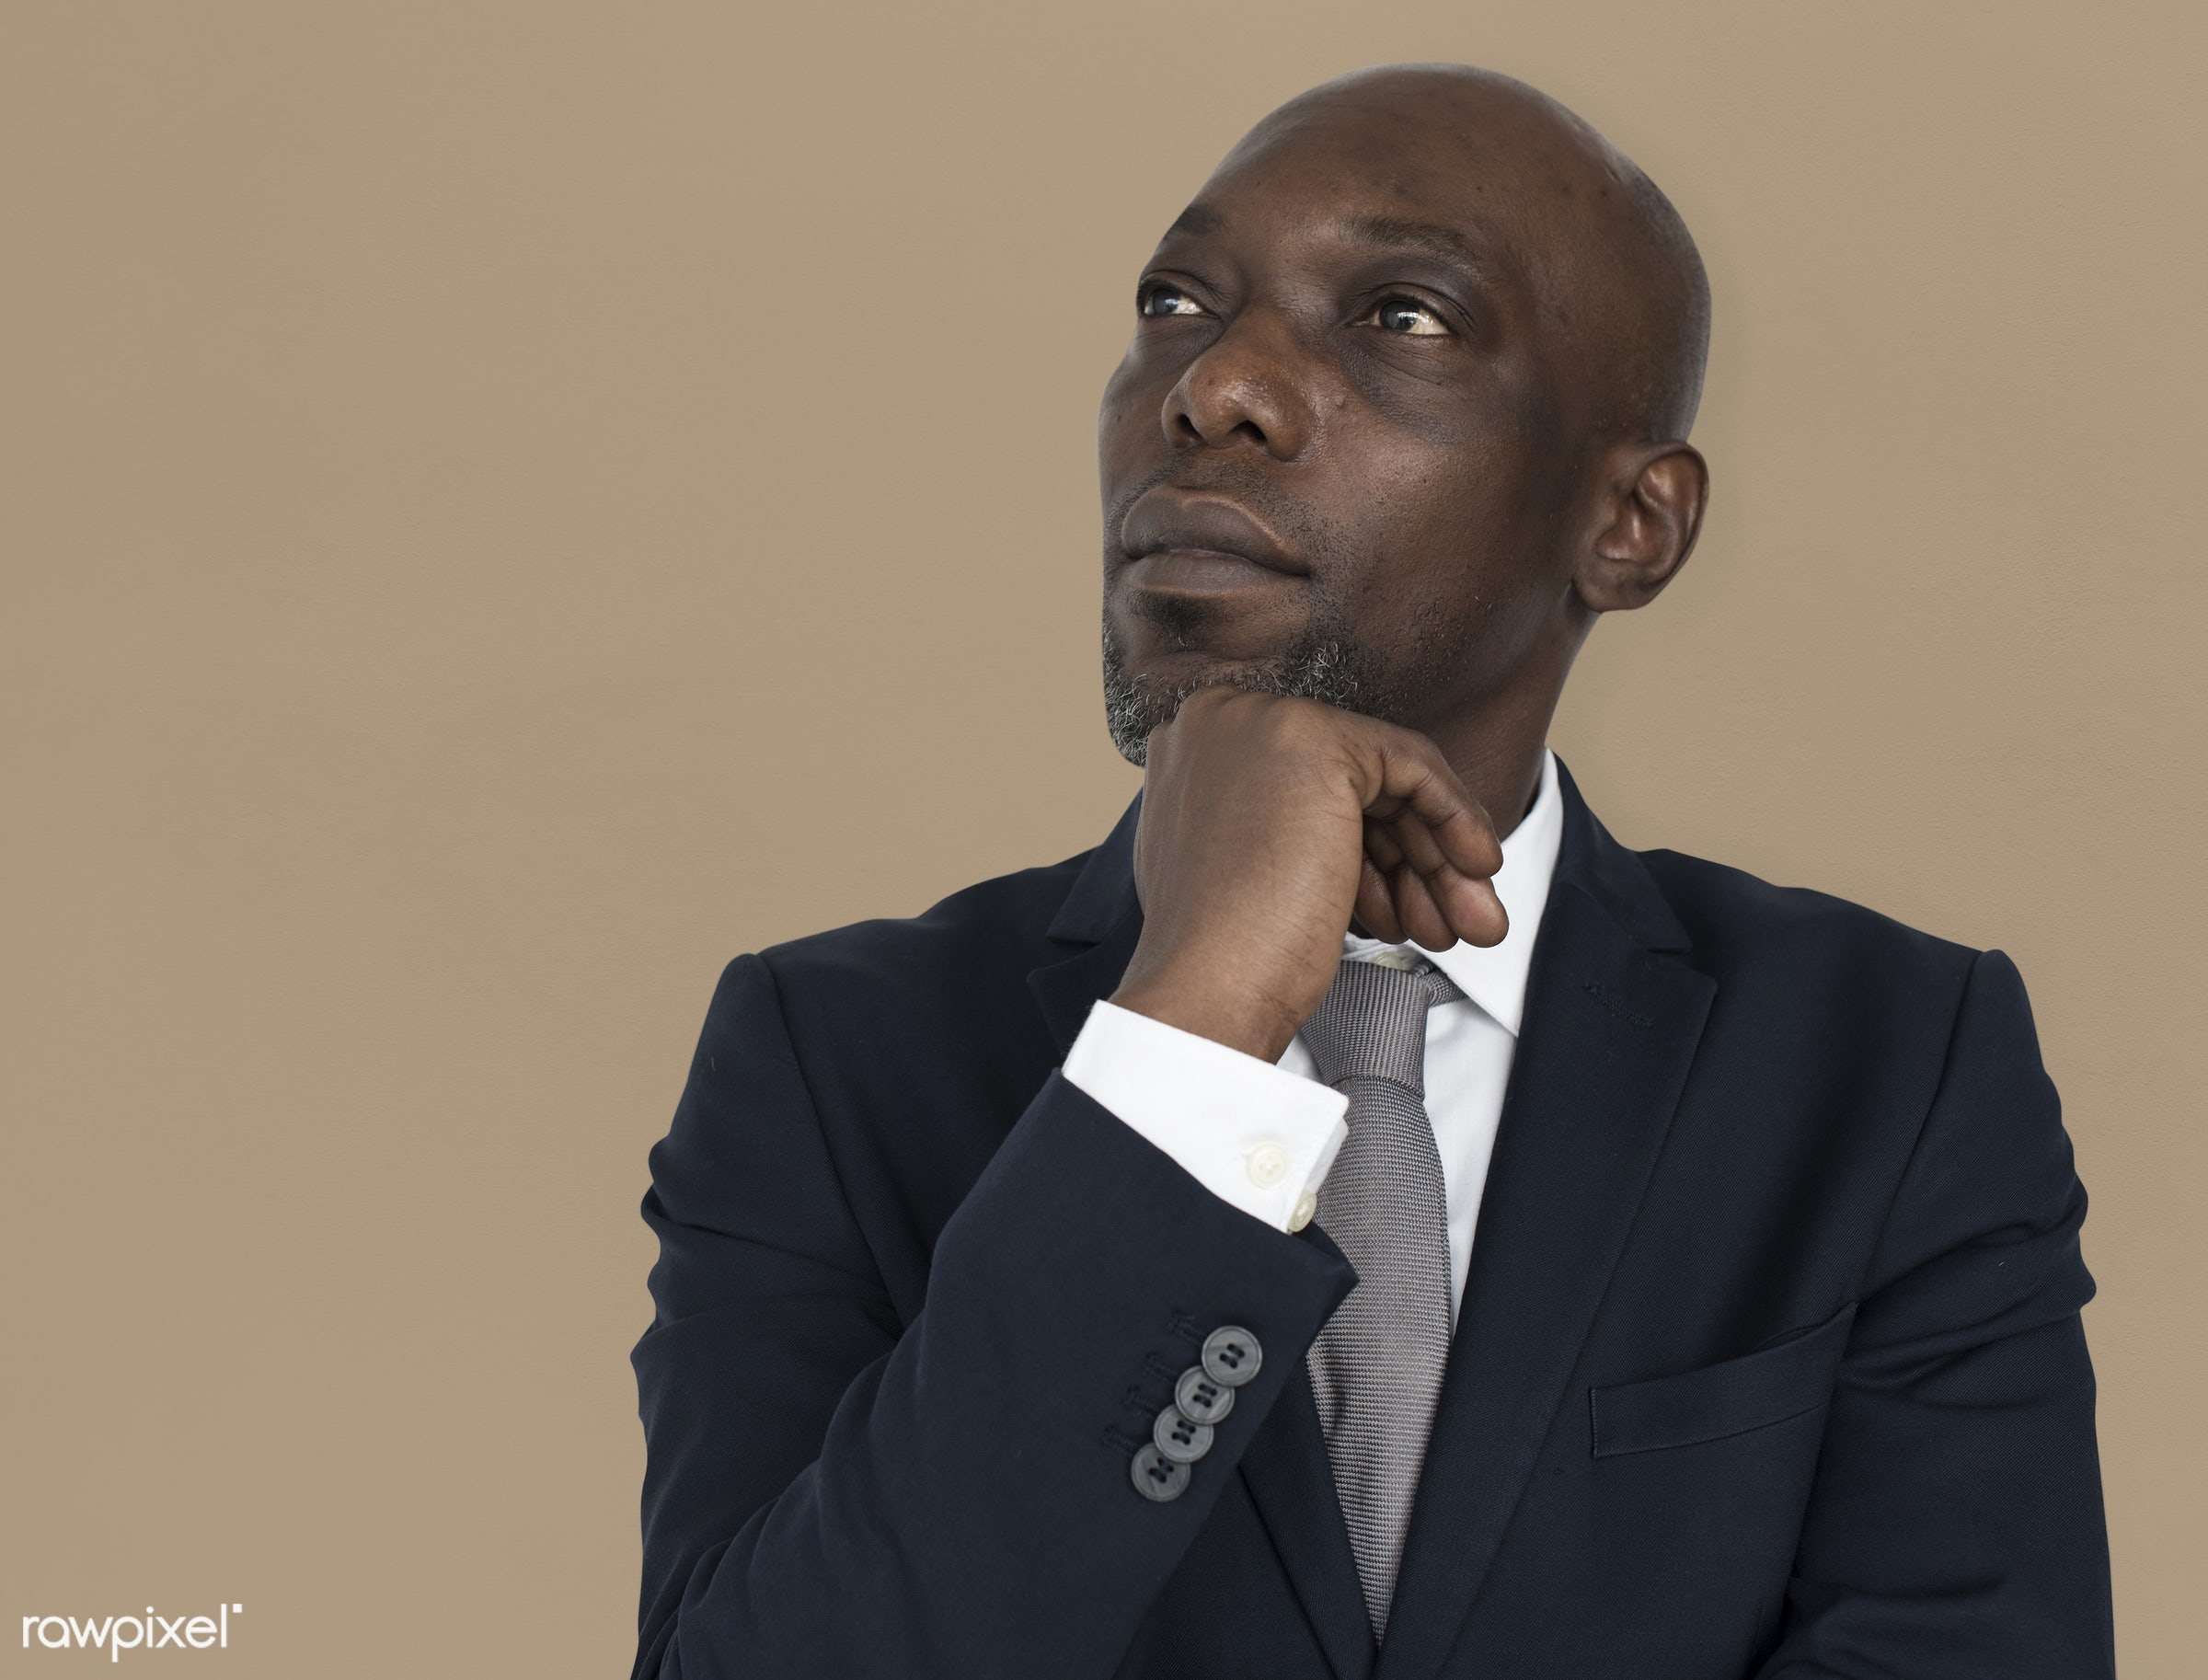 black, african, african american, suit, tie, portrait, business, businessman, professional, think